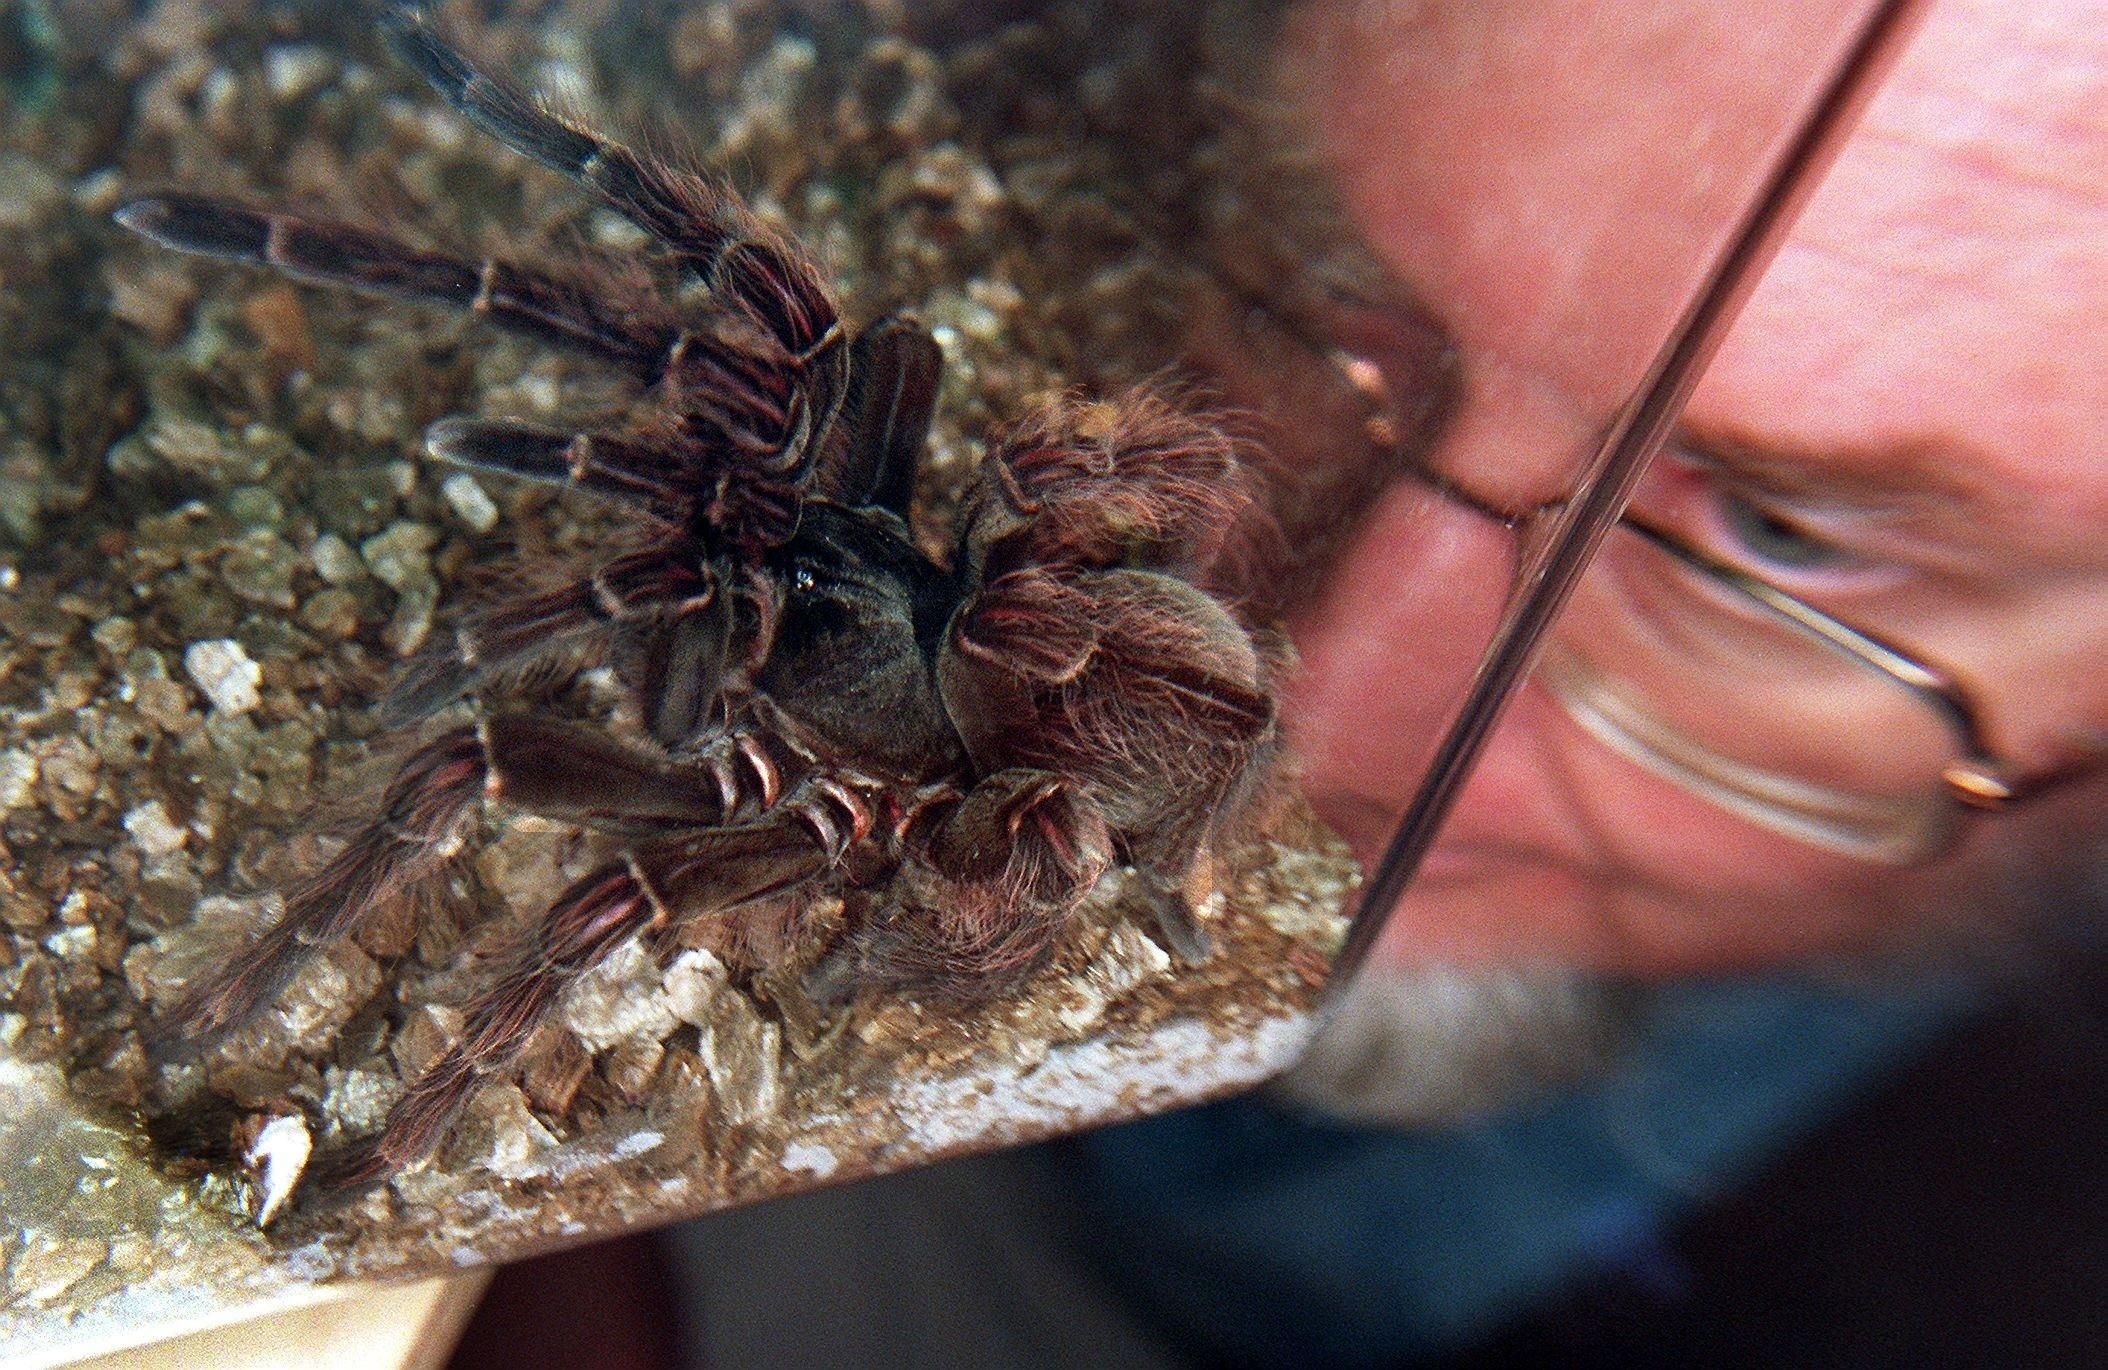 goliath bird eating tarantula